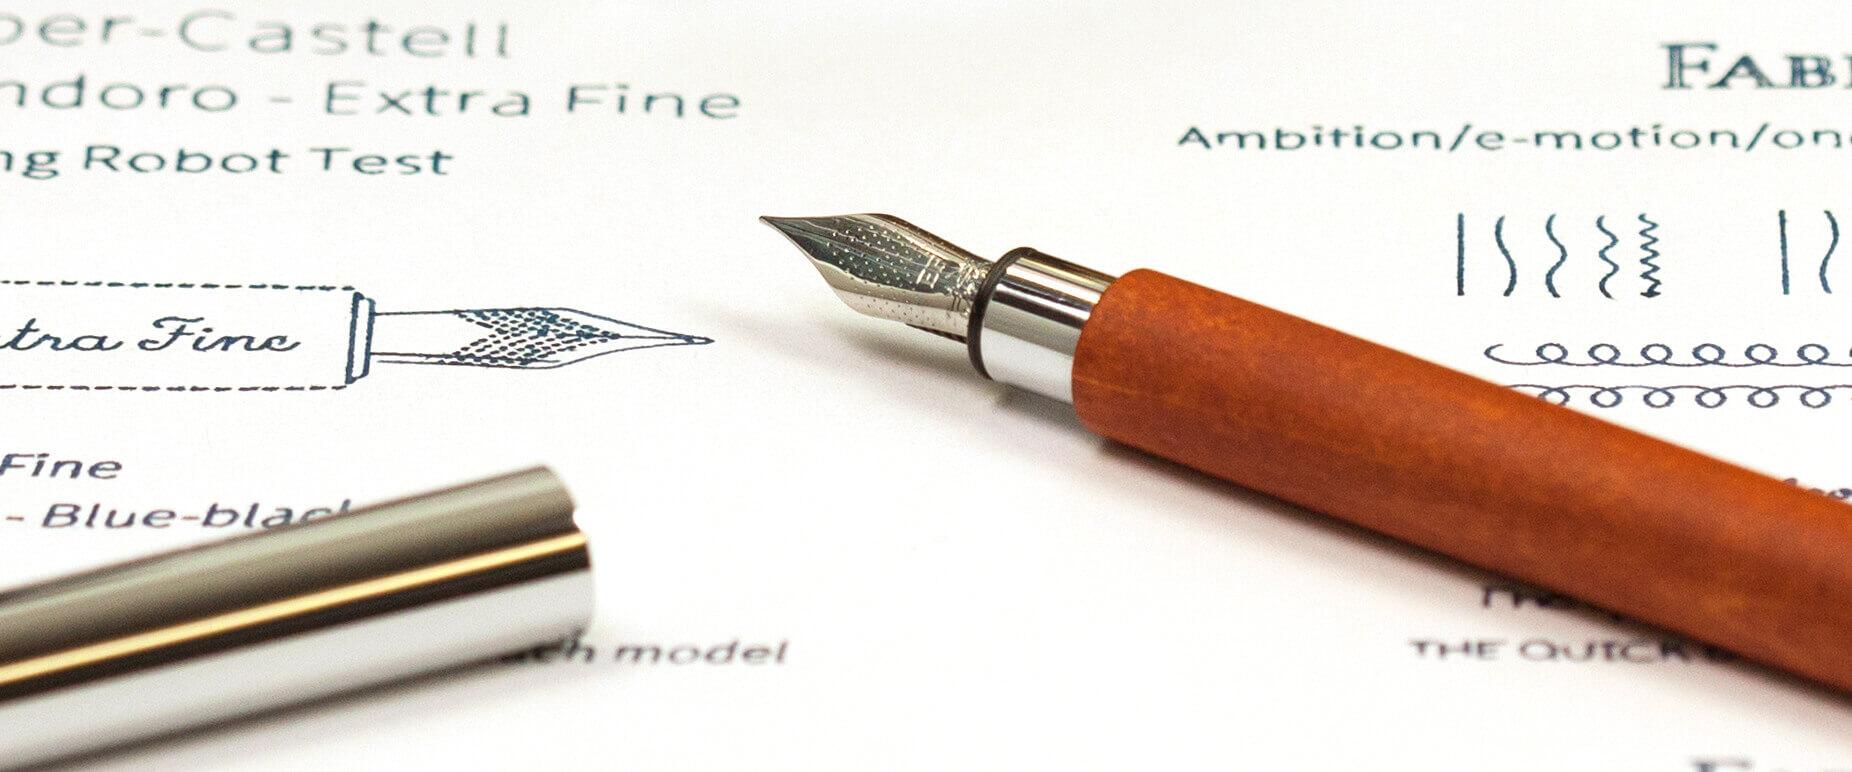 extra fine fountain pen